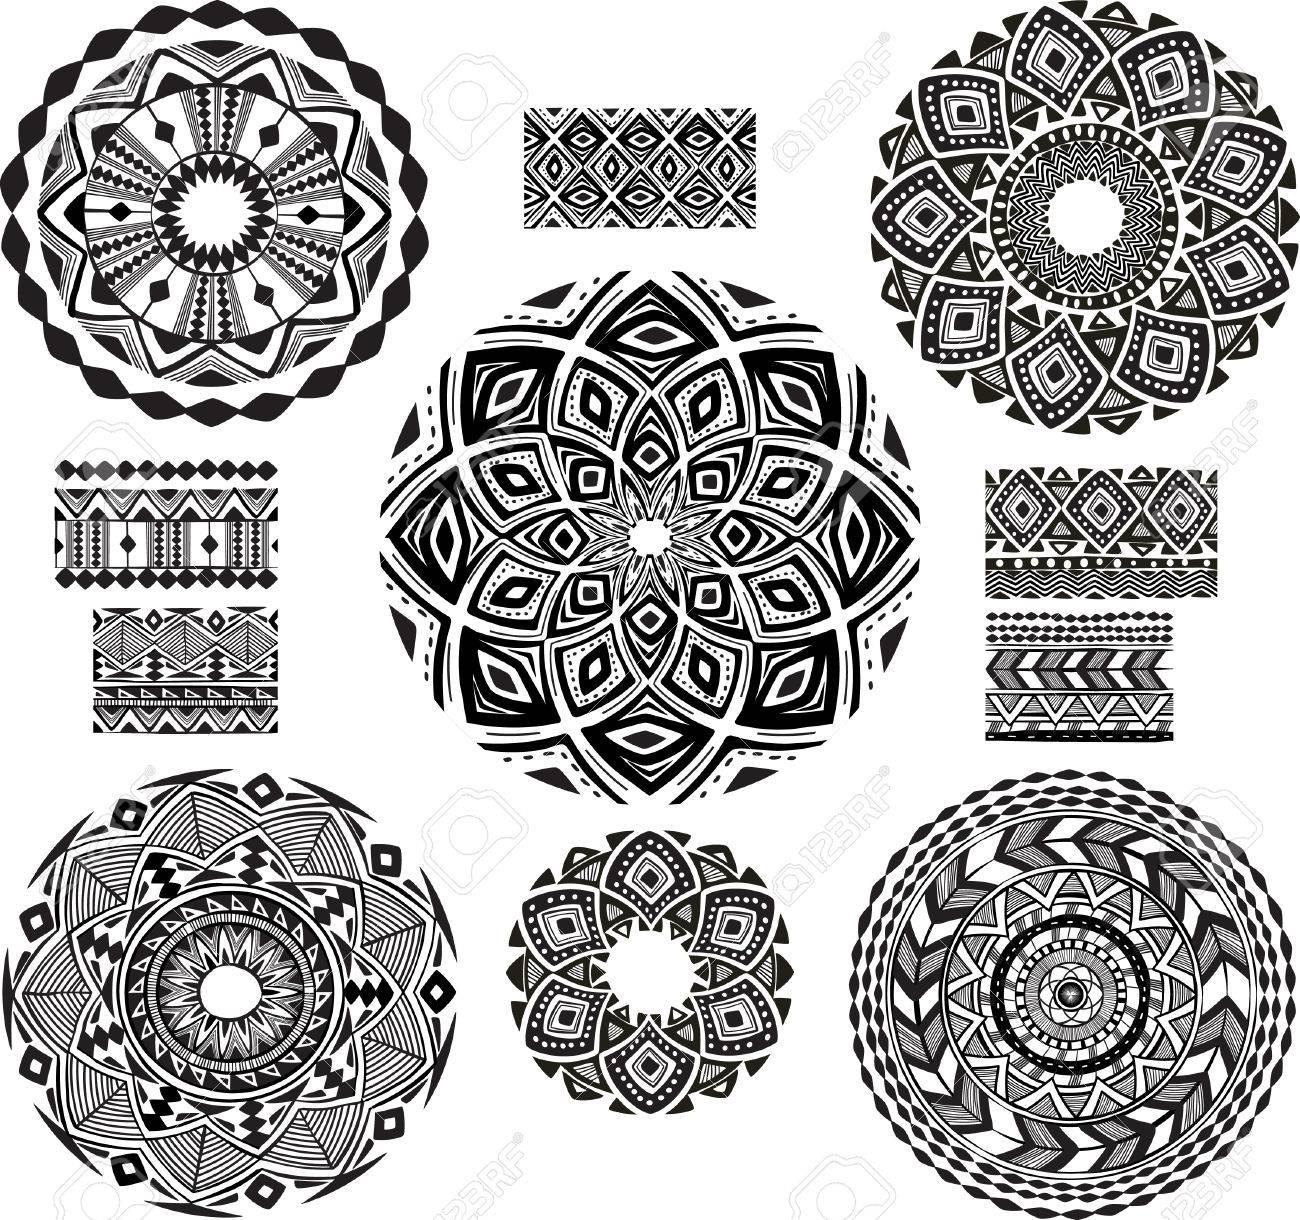 Round Ornament Pattern with pattern brash - 26040731